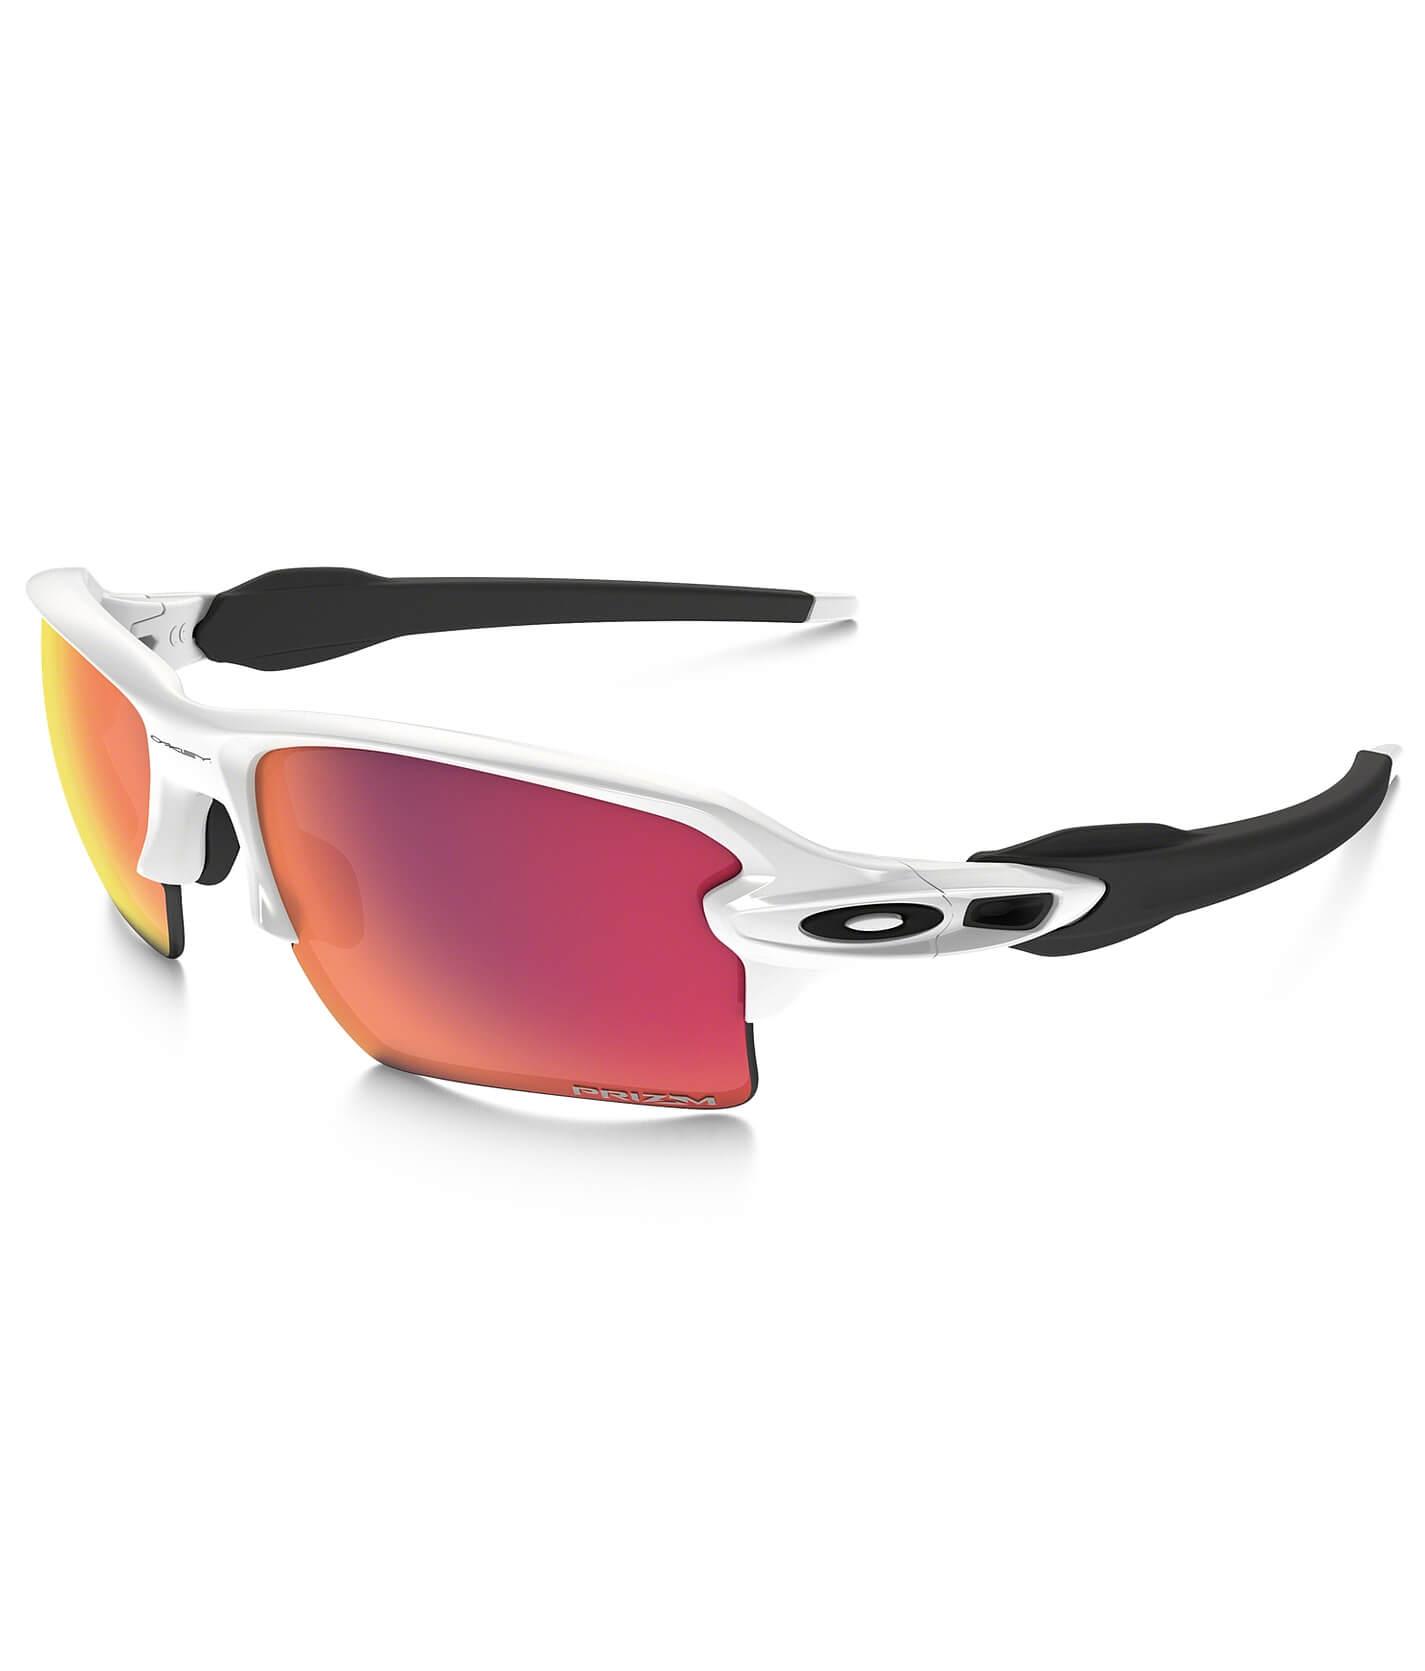 Oakley Prizm™ Baseball Flak 2.0 Sunglasses | Tuggl